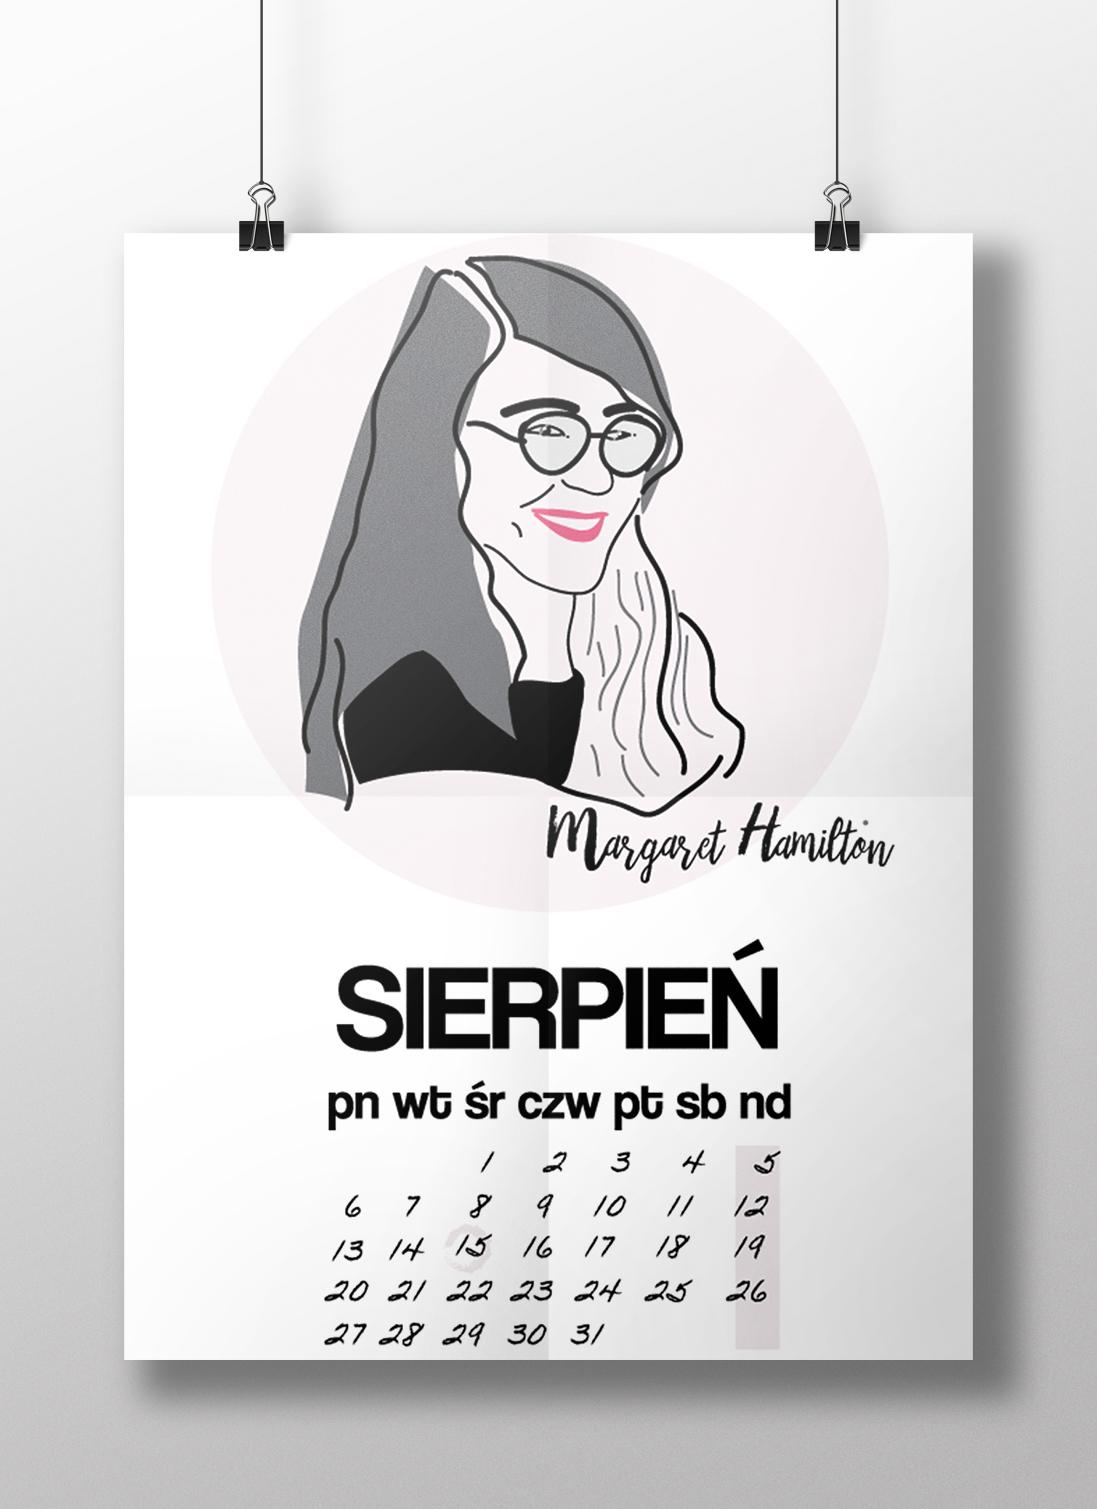 hamilton kalendarz - Feministyczny kalendarz na sierpień. Margaret Hamilton